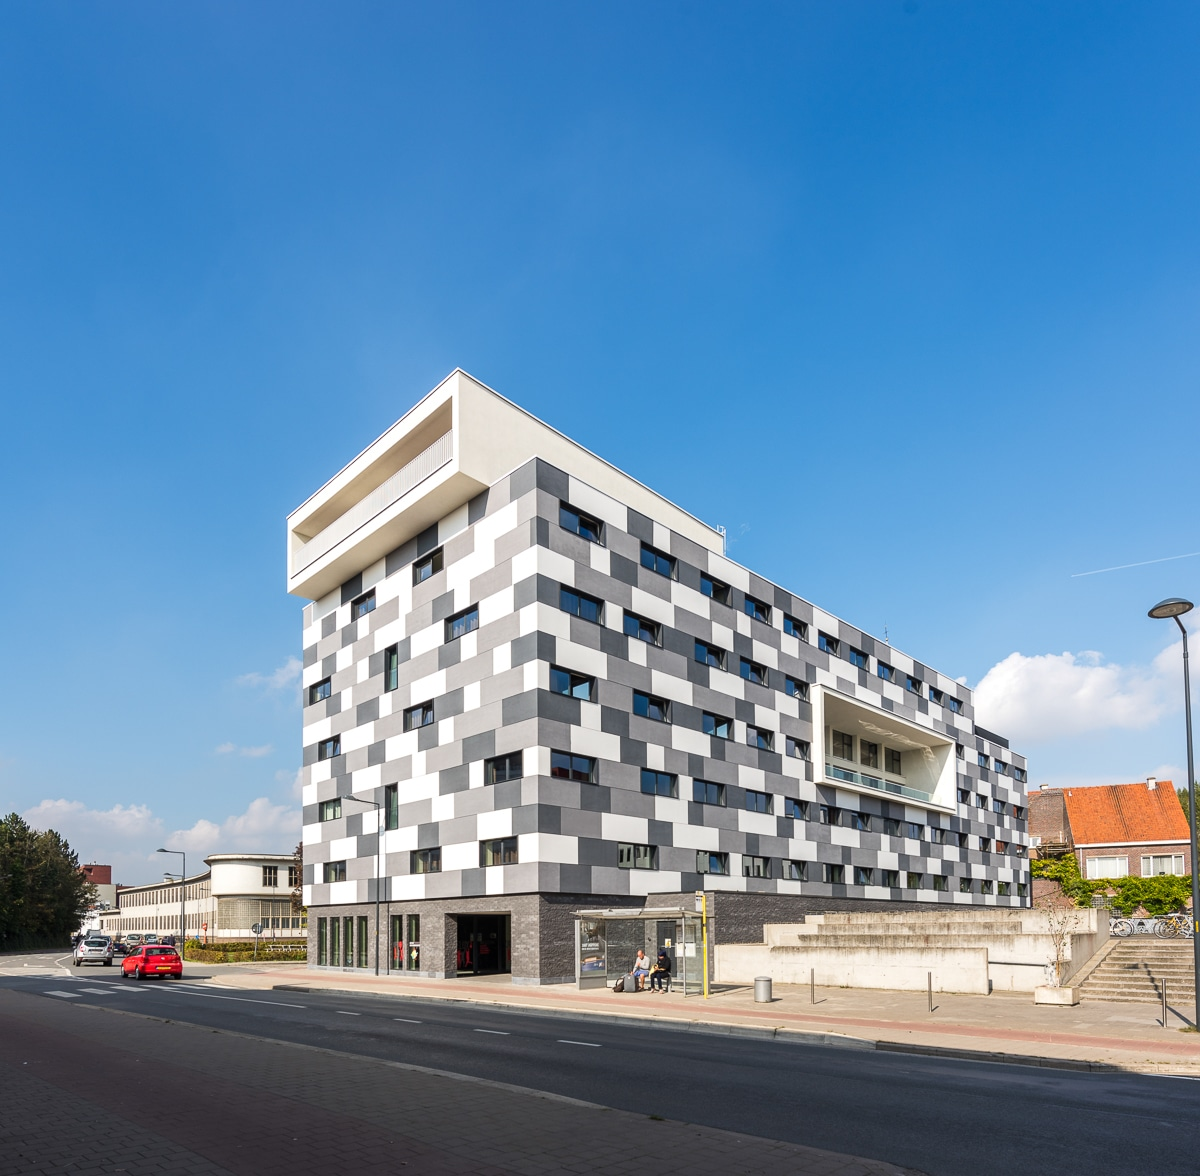 UE BO 026web | Baeyens & Beck architecten Gent | architect nieuwbouw renovatie interieur | high end | architectenbureau